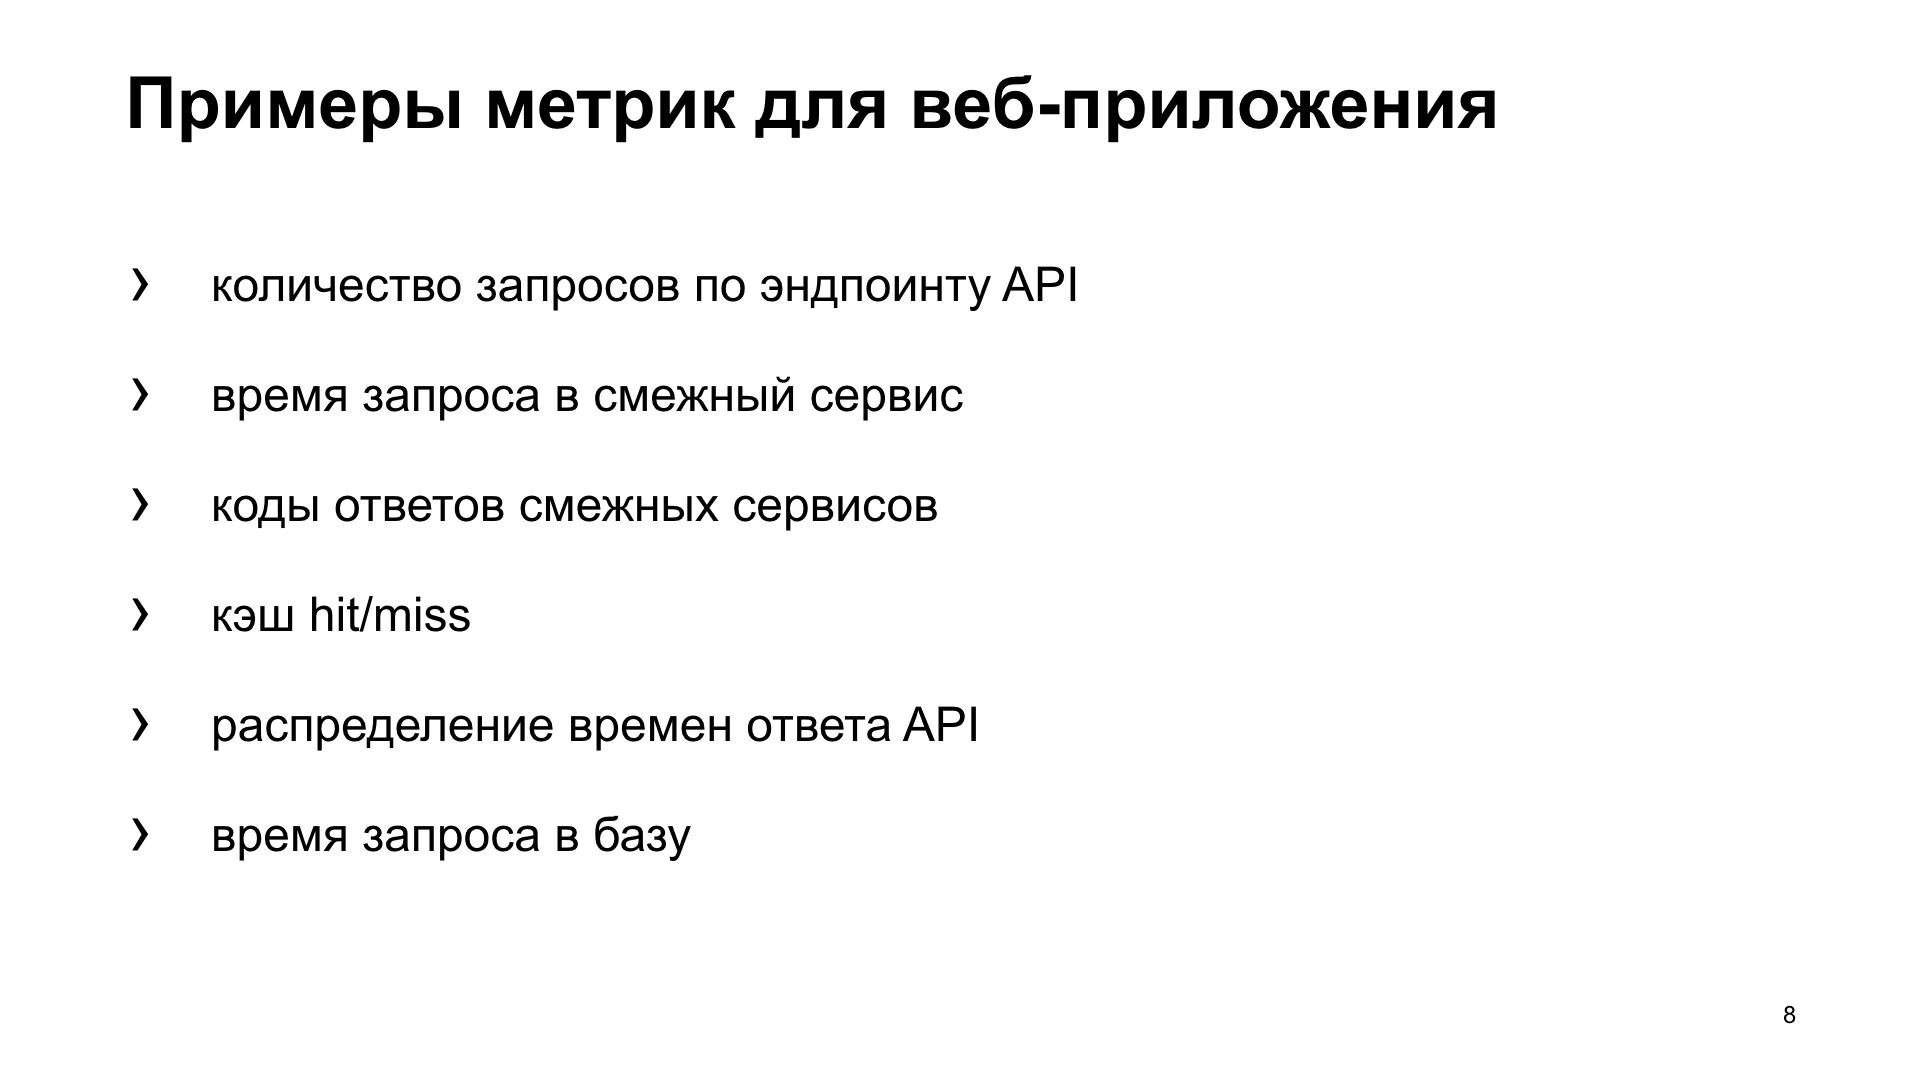 uWSGI в помощь метрикам. Доклад Яндекса - 4